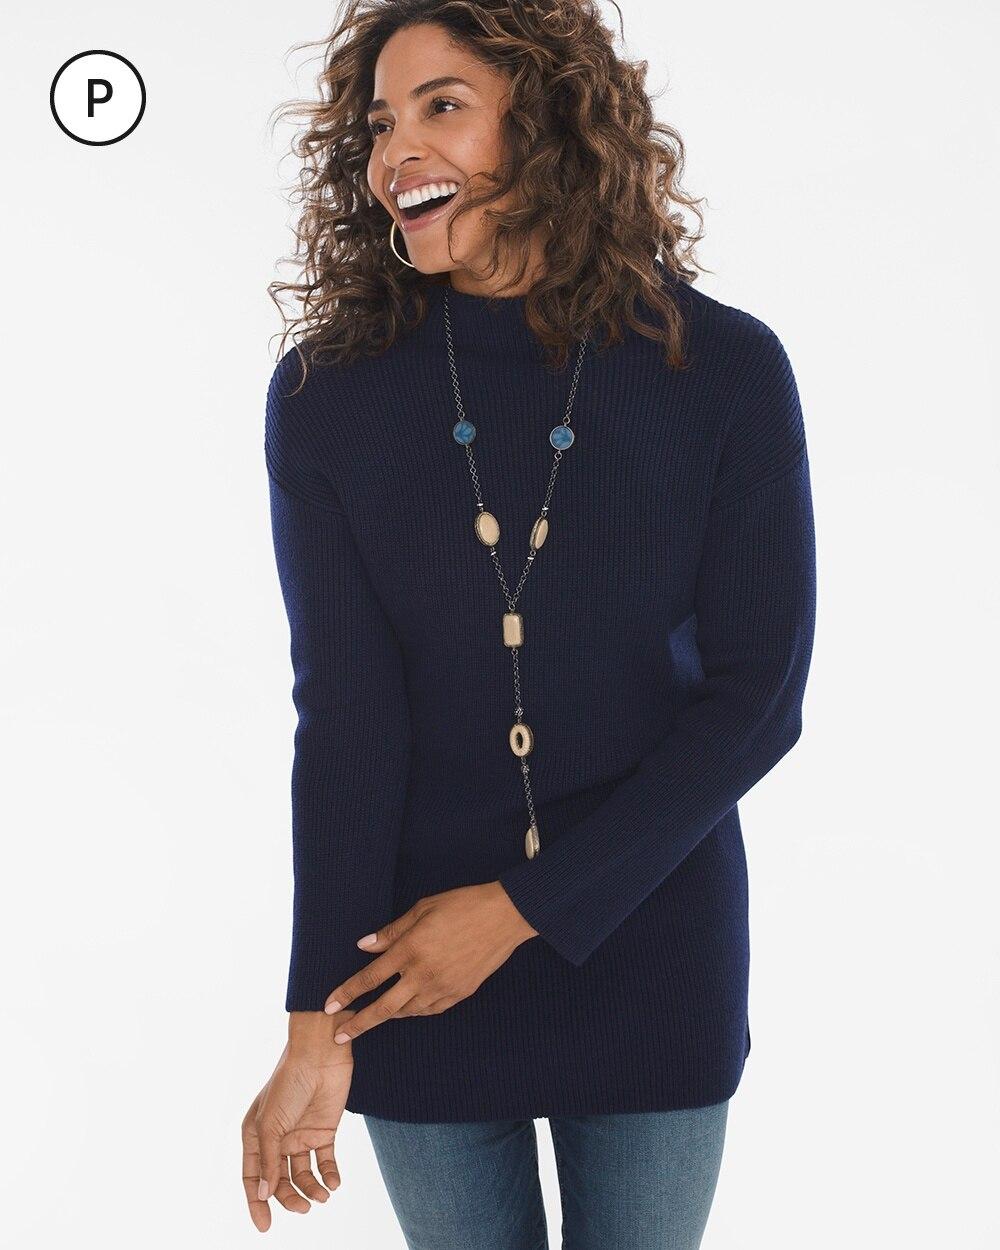 Petite Tunic Sweater